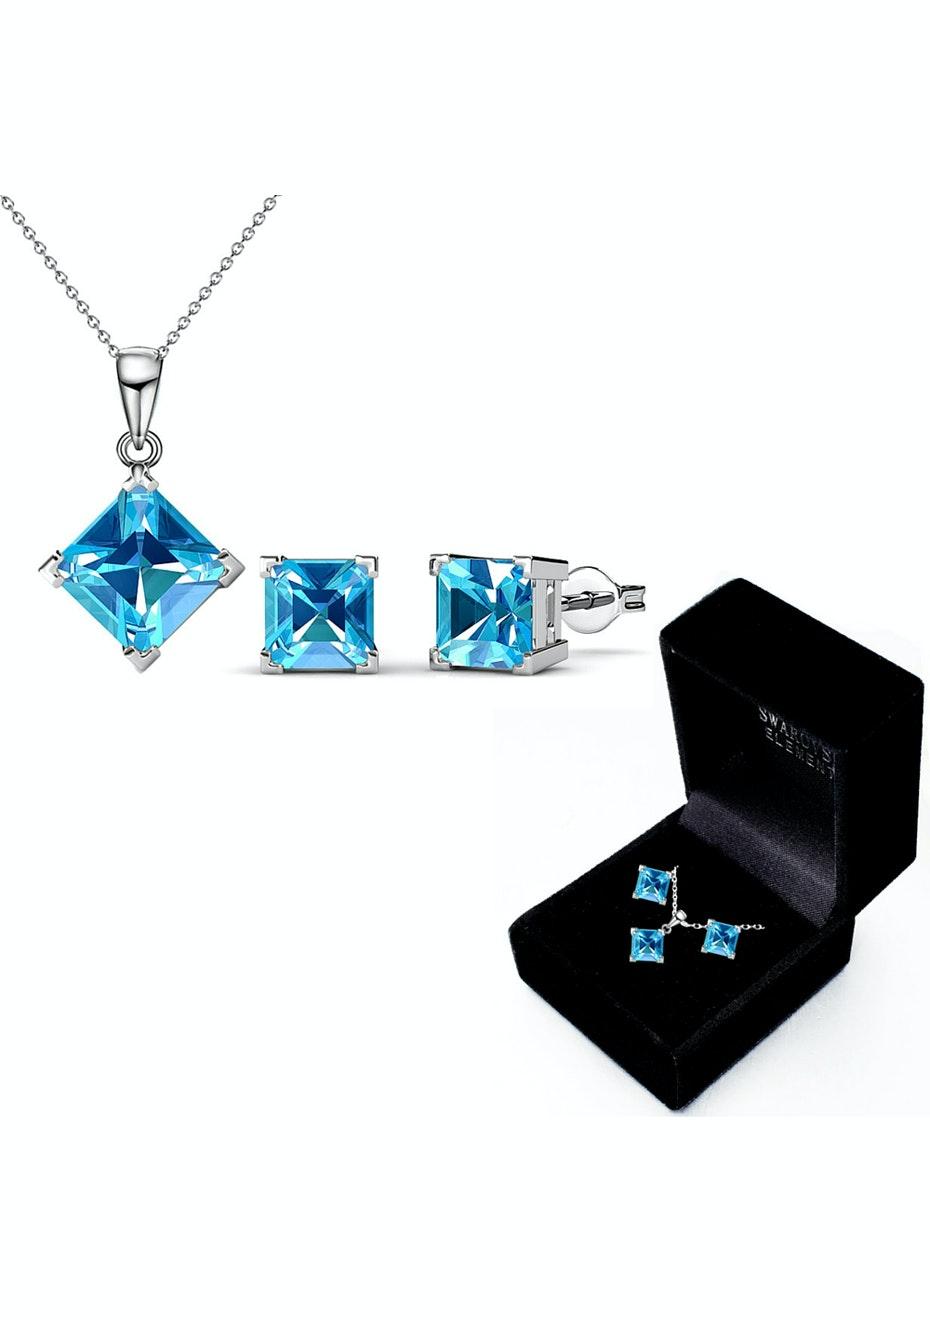 Boxed Matching Set Ft Swarovski Elements - Light Blue